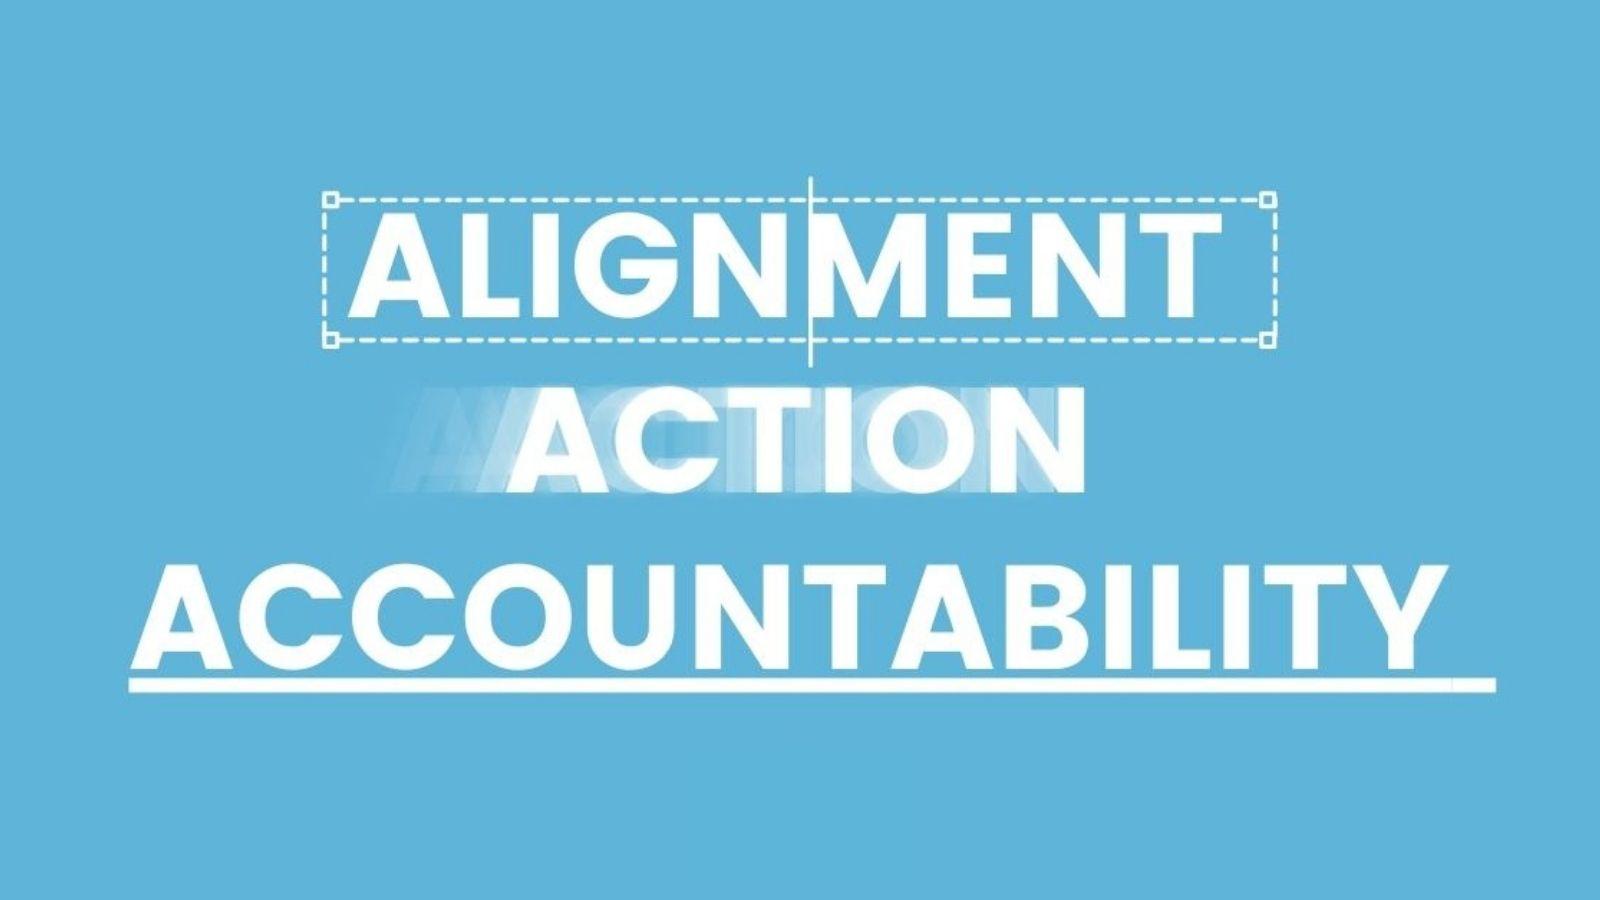 Alignment, Action, Accountability